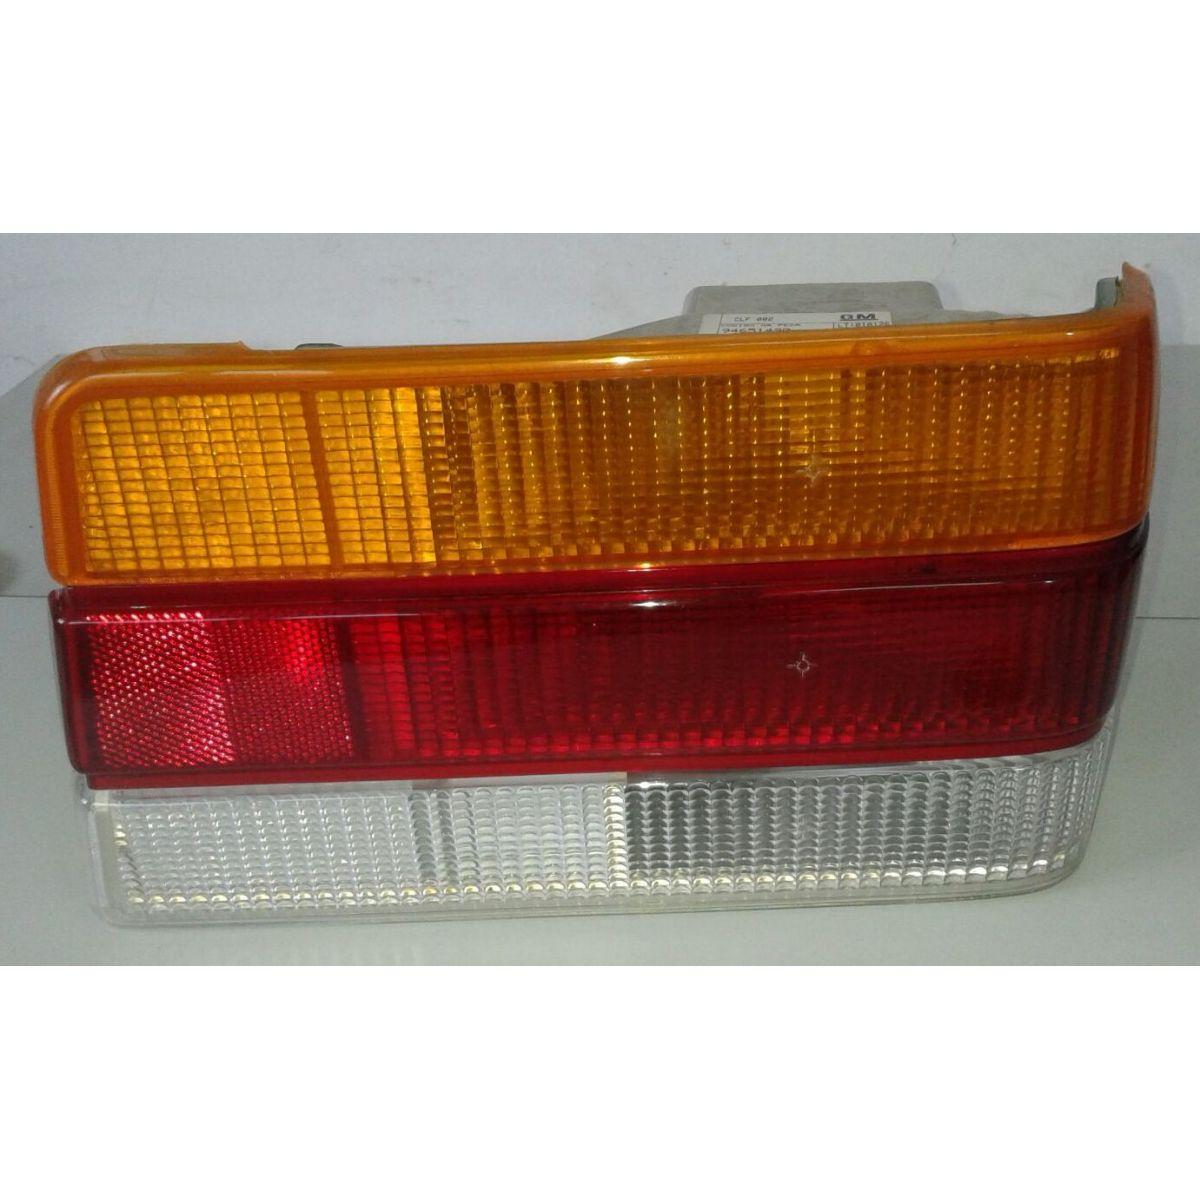 Lanterna Traseira Chevette 87 a 94  - Amd Auto Peças